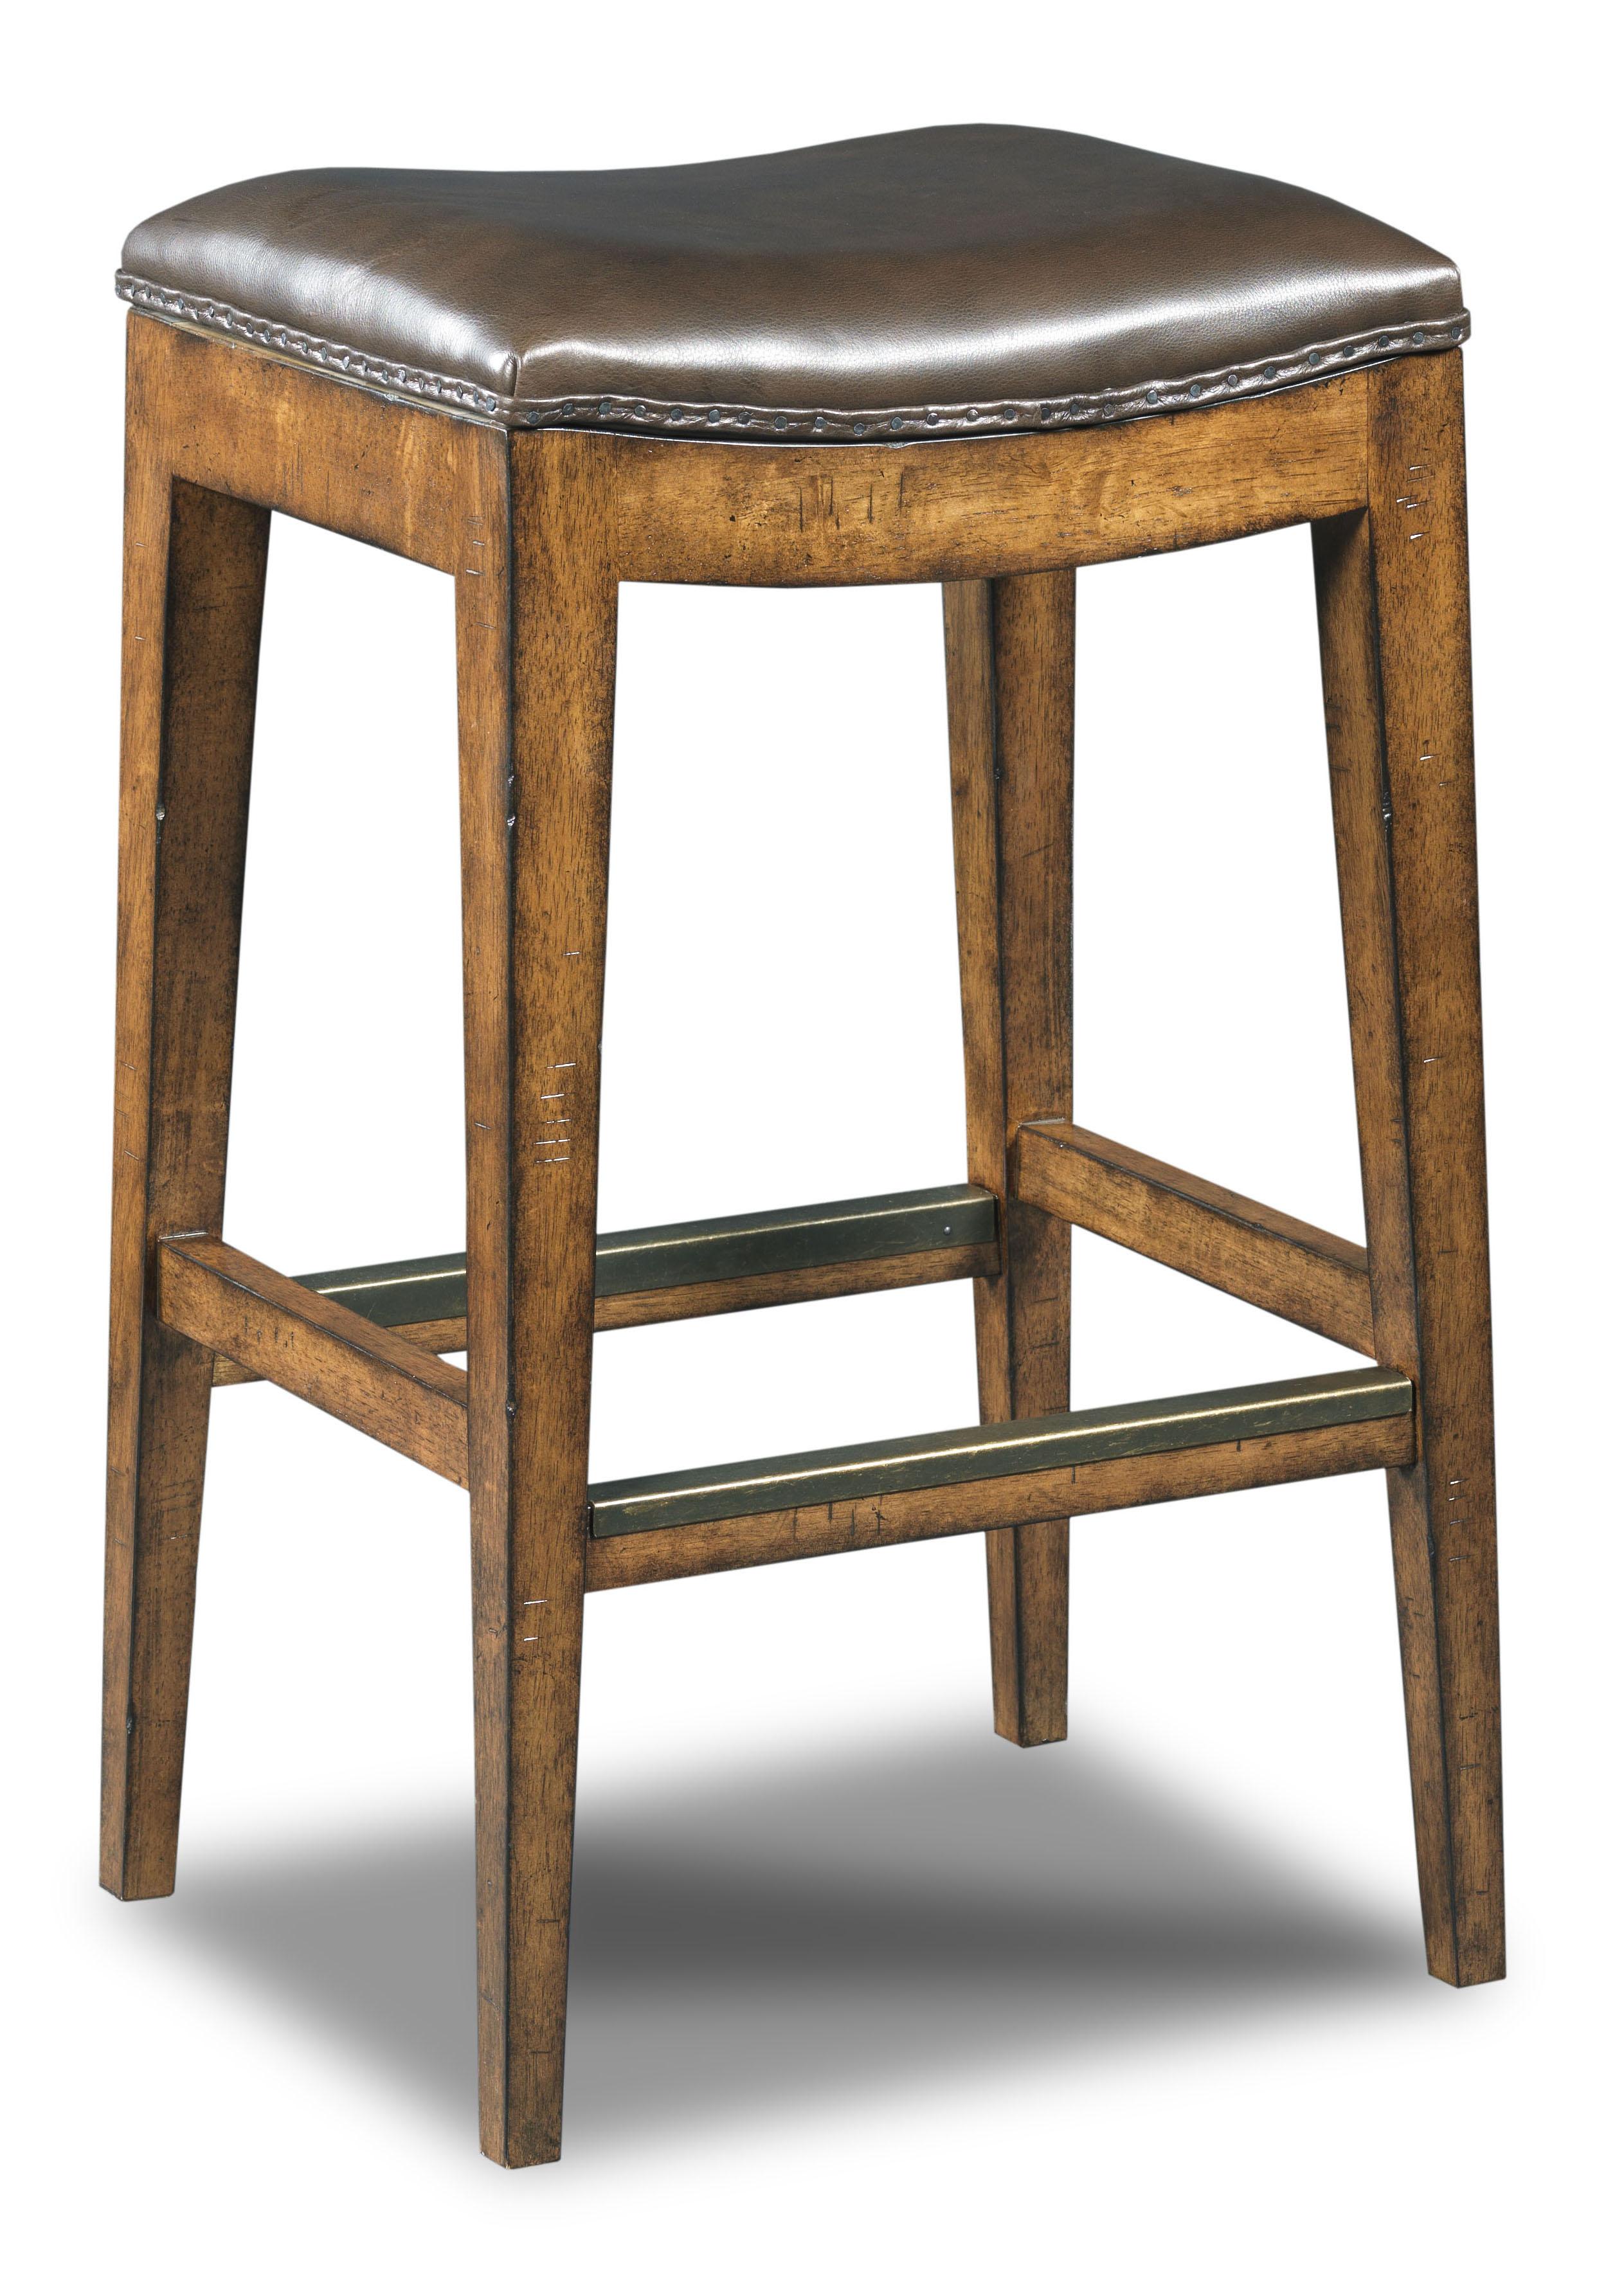 Hooker Furniture Stools Medium Sangria Rec Backless Barstool - Item Number: 300-20014